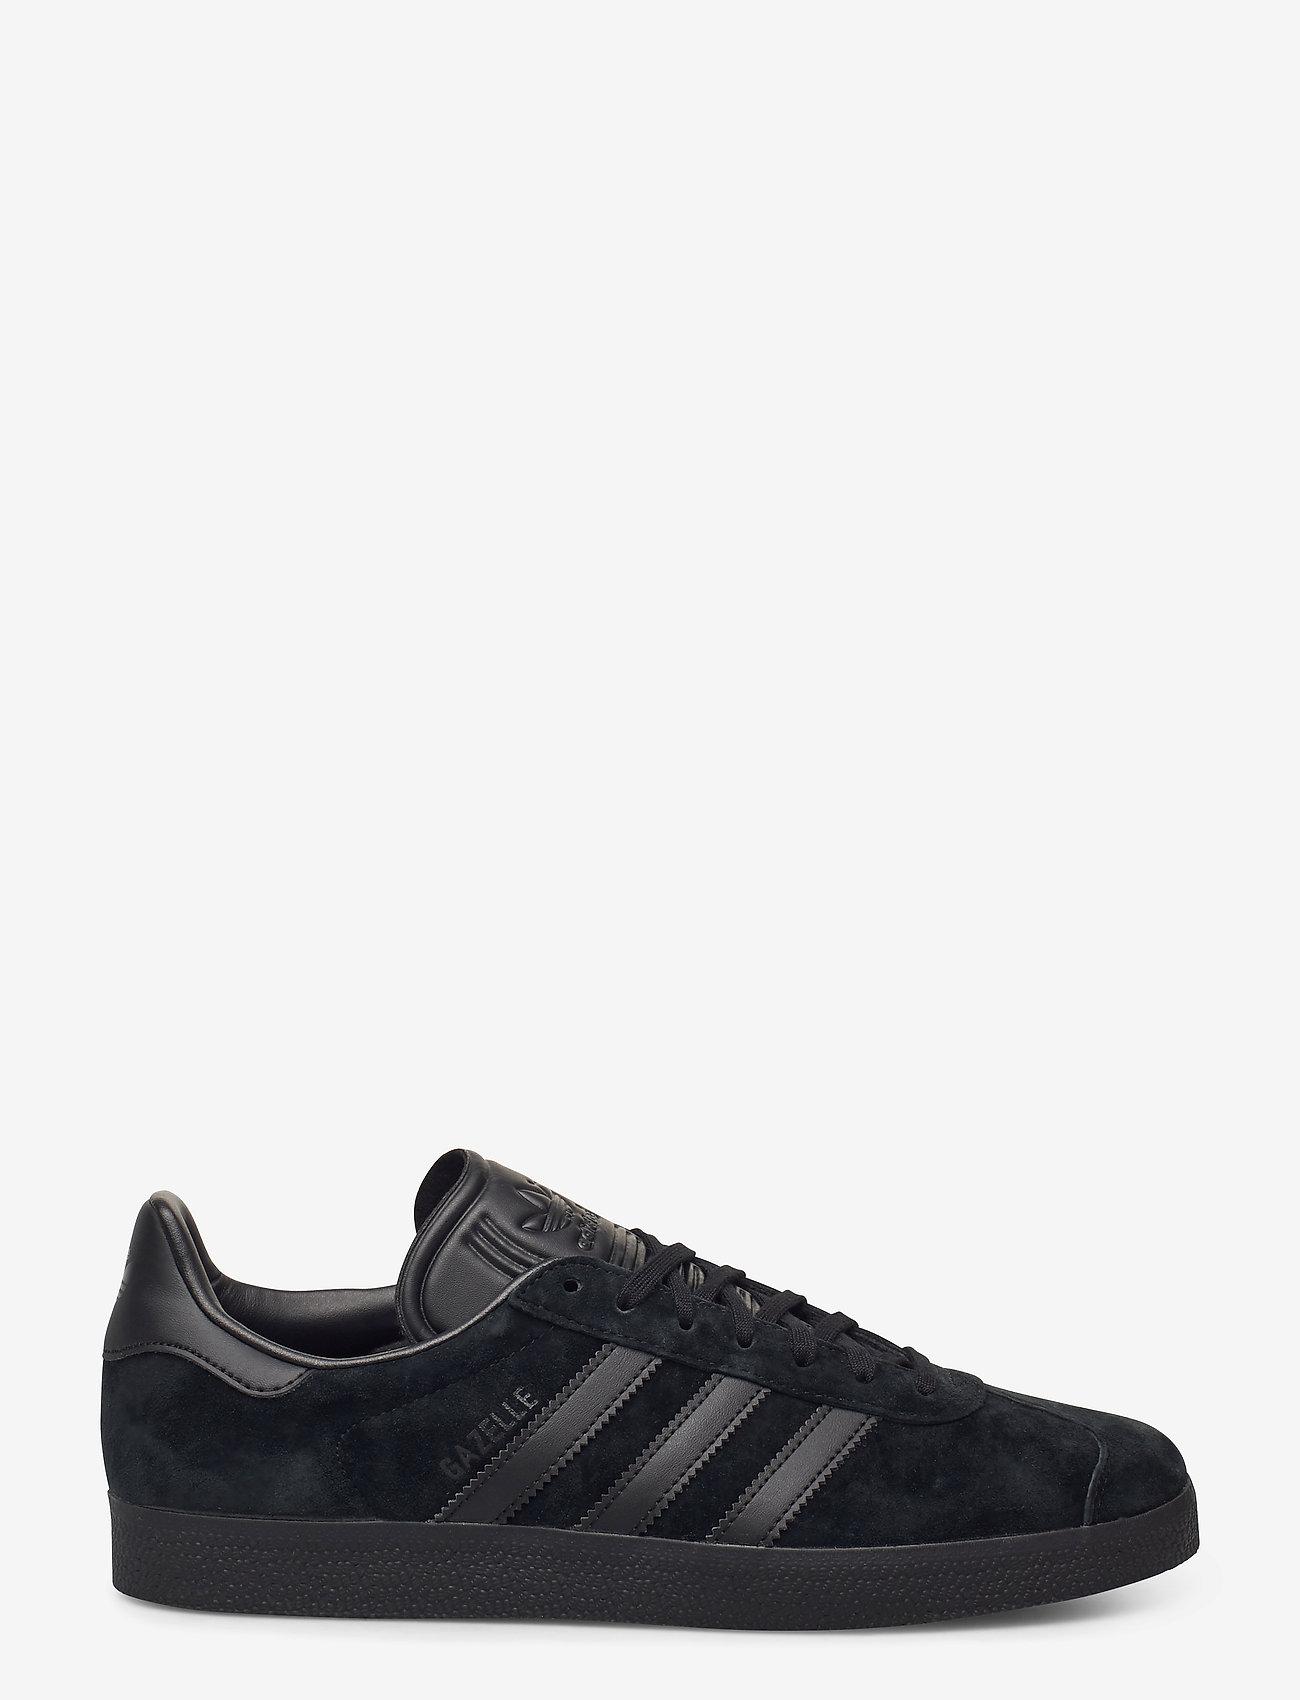 adidas Originals - Gazelle - lav ankel - cblack/cblack/cblack - 1